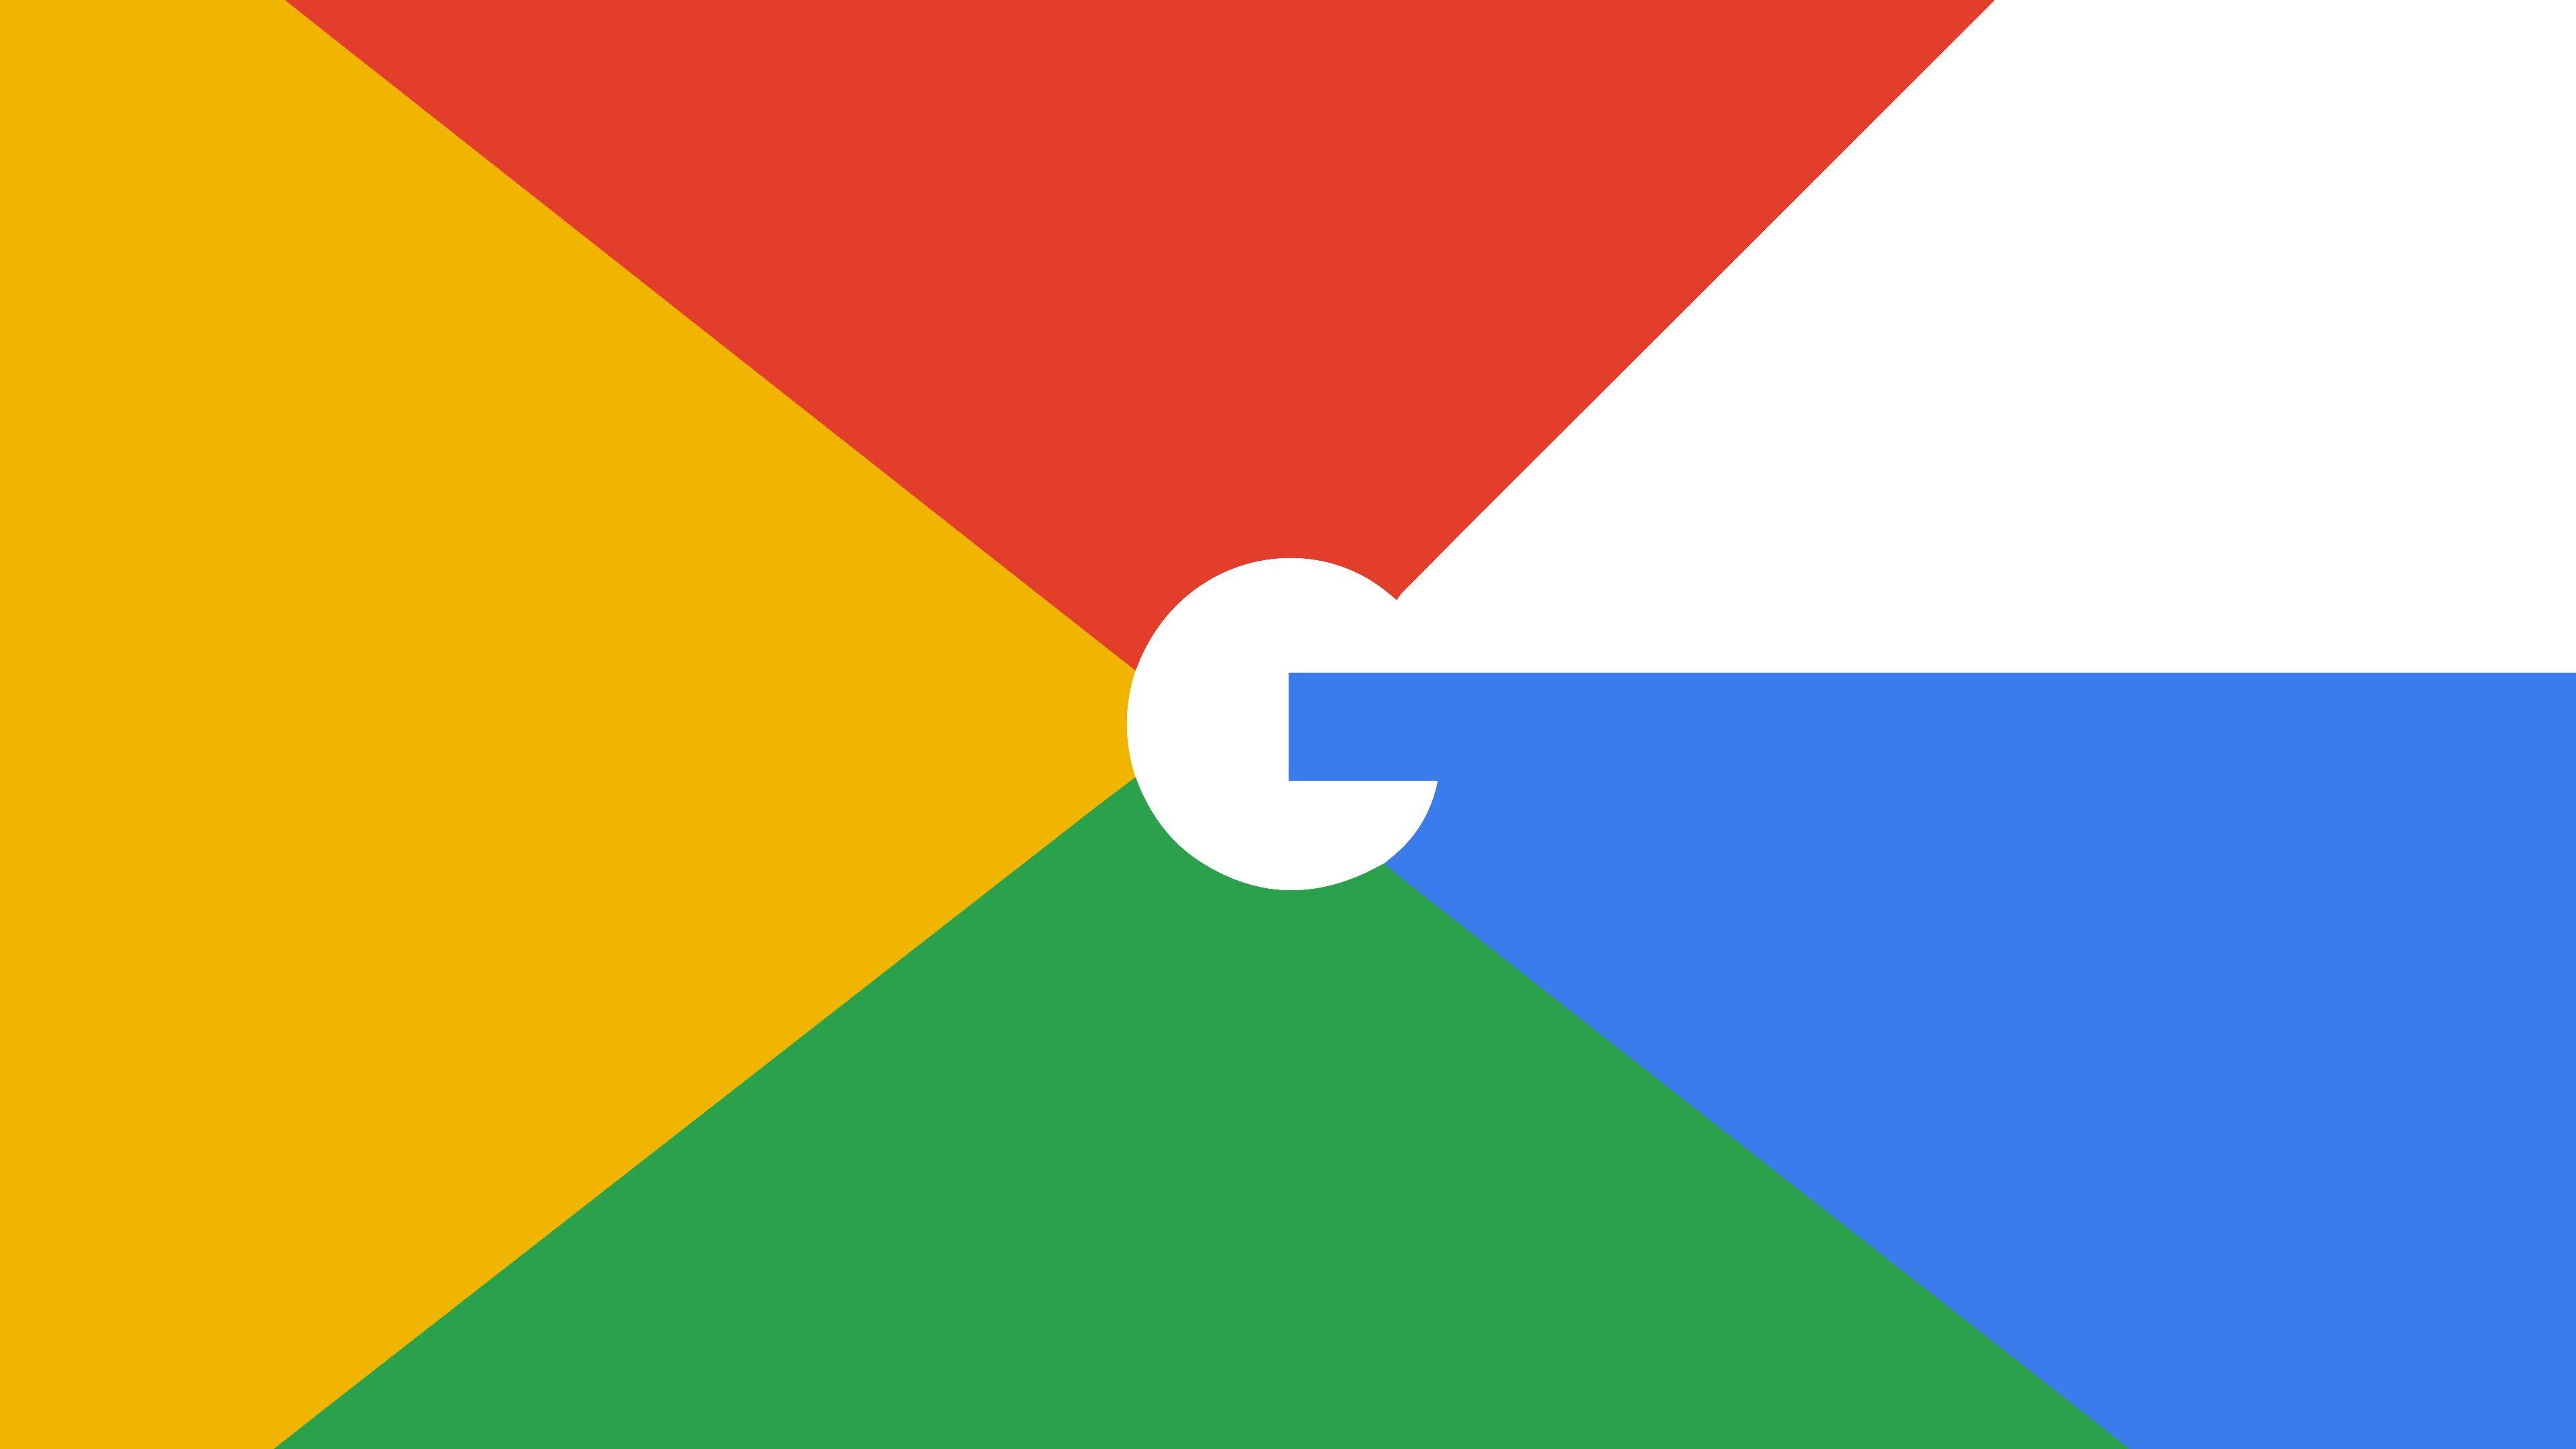 new wallpaper for google - photo #25